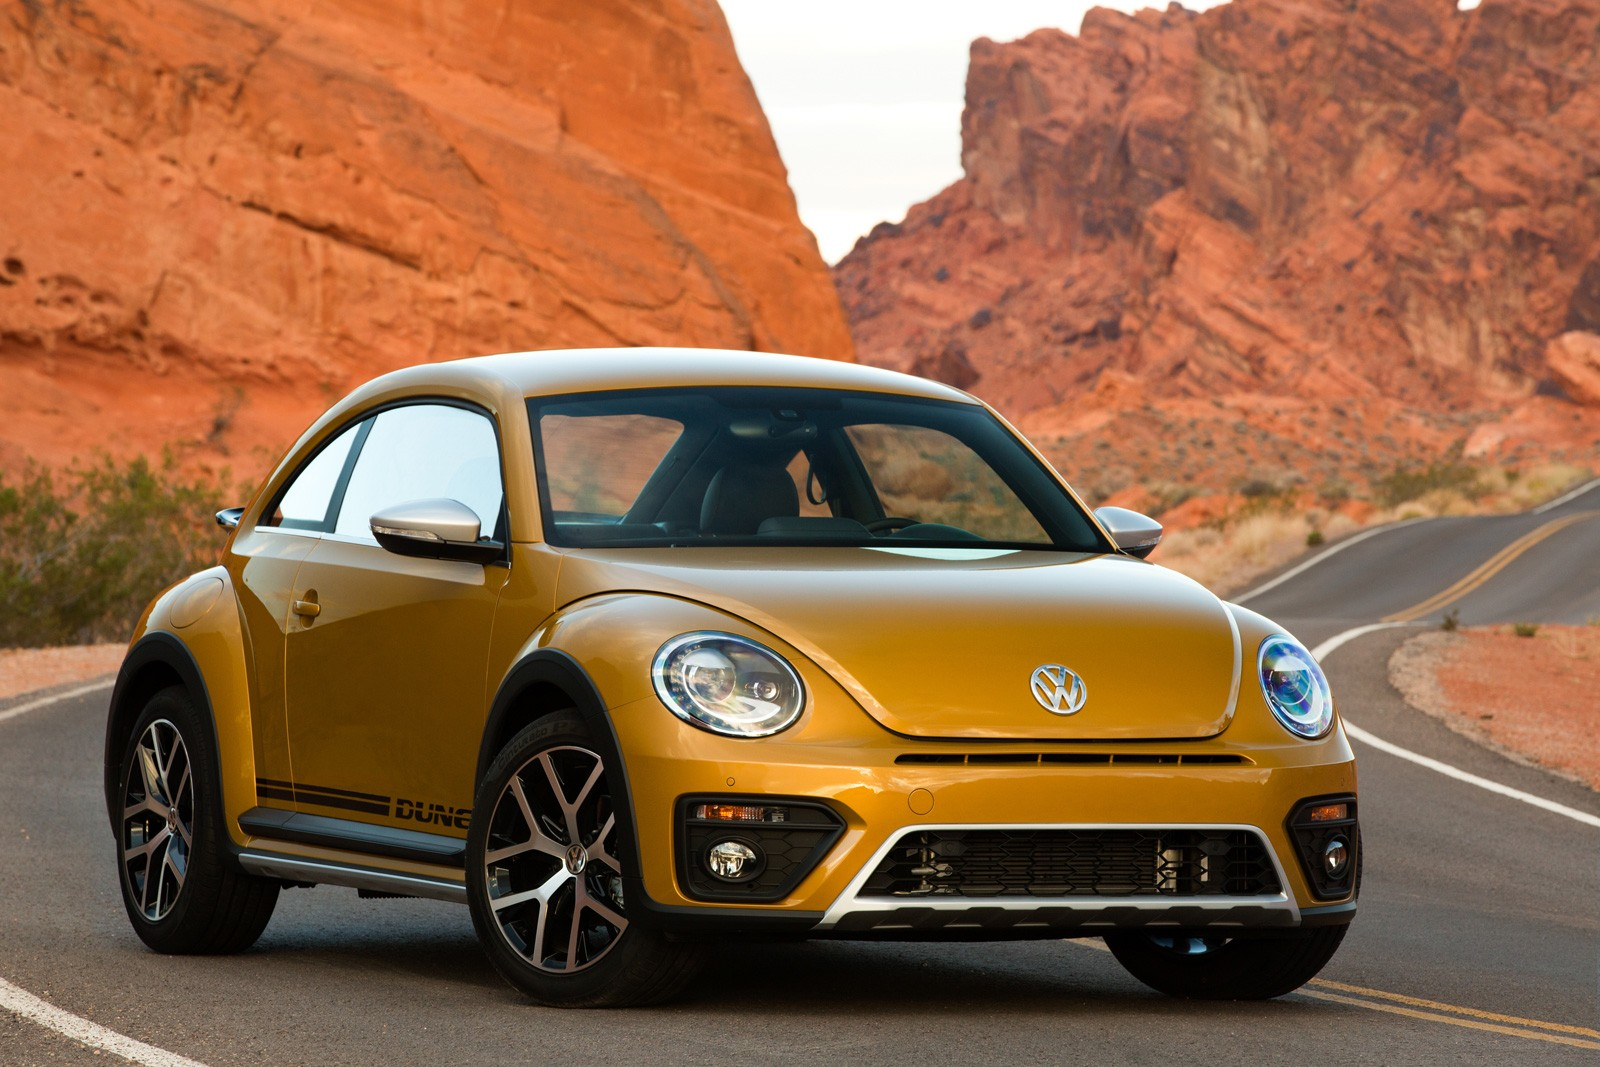 VW Considers Making An Electric Beetle - Volkswagen credit login